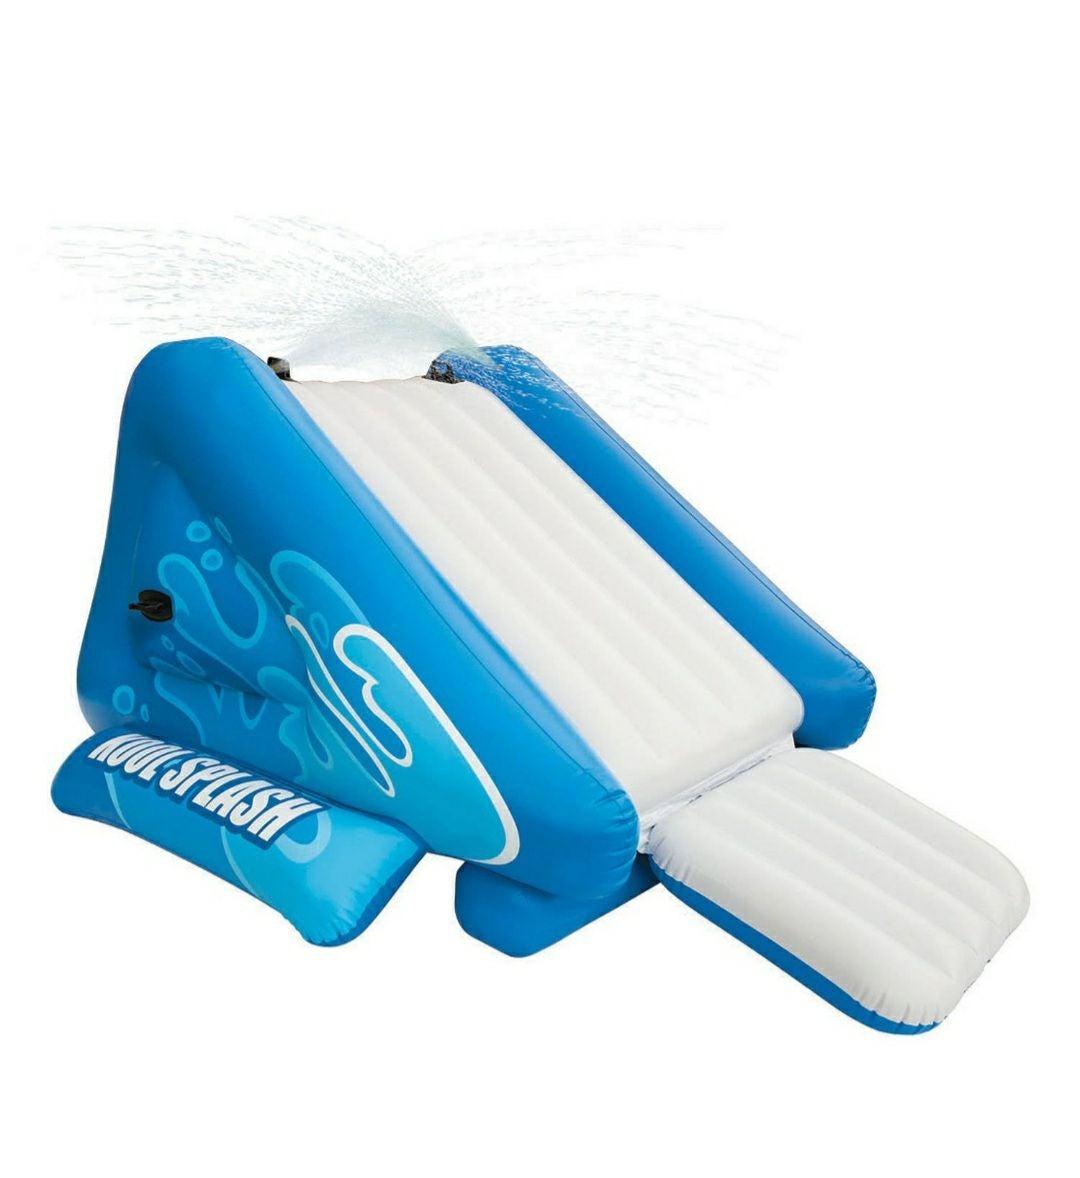 Intex Kool Splash slide..CK